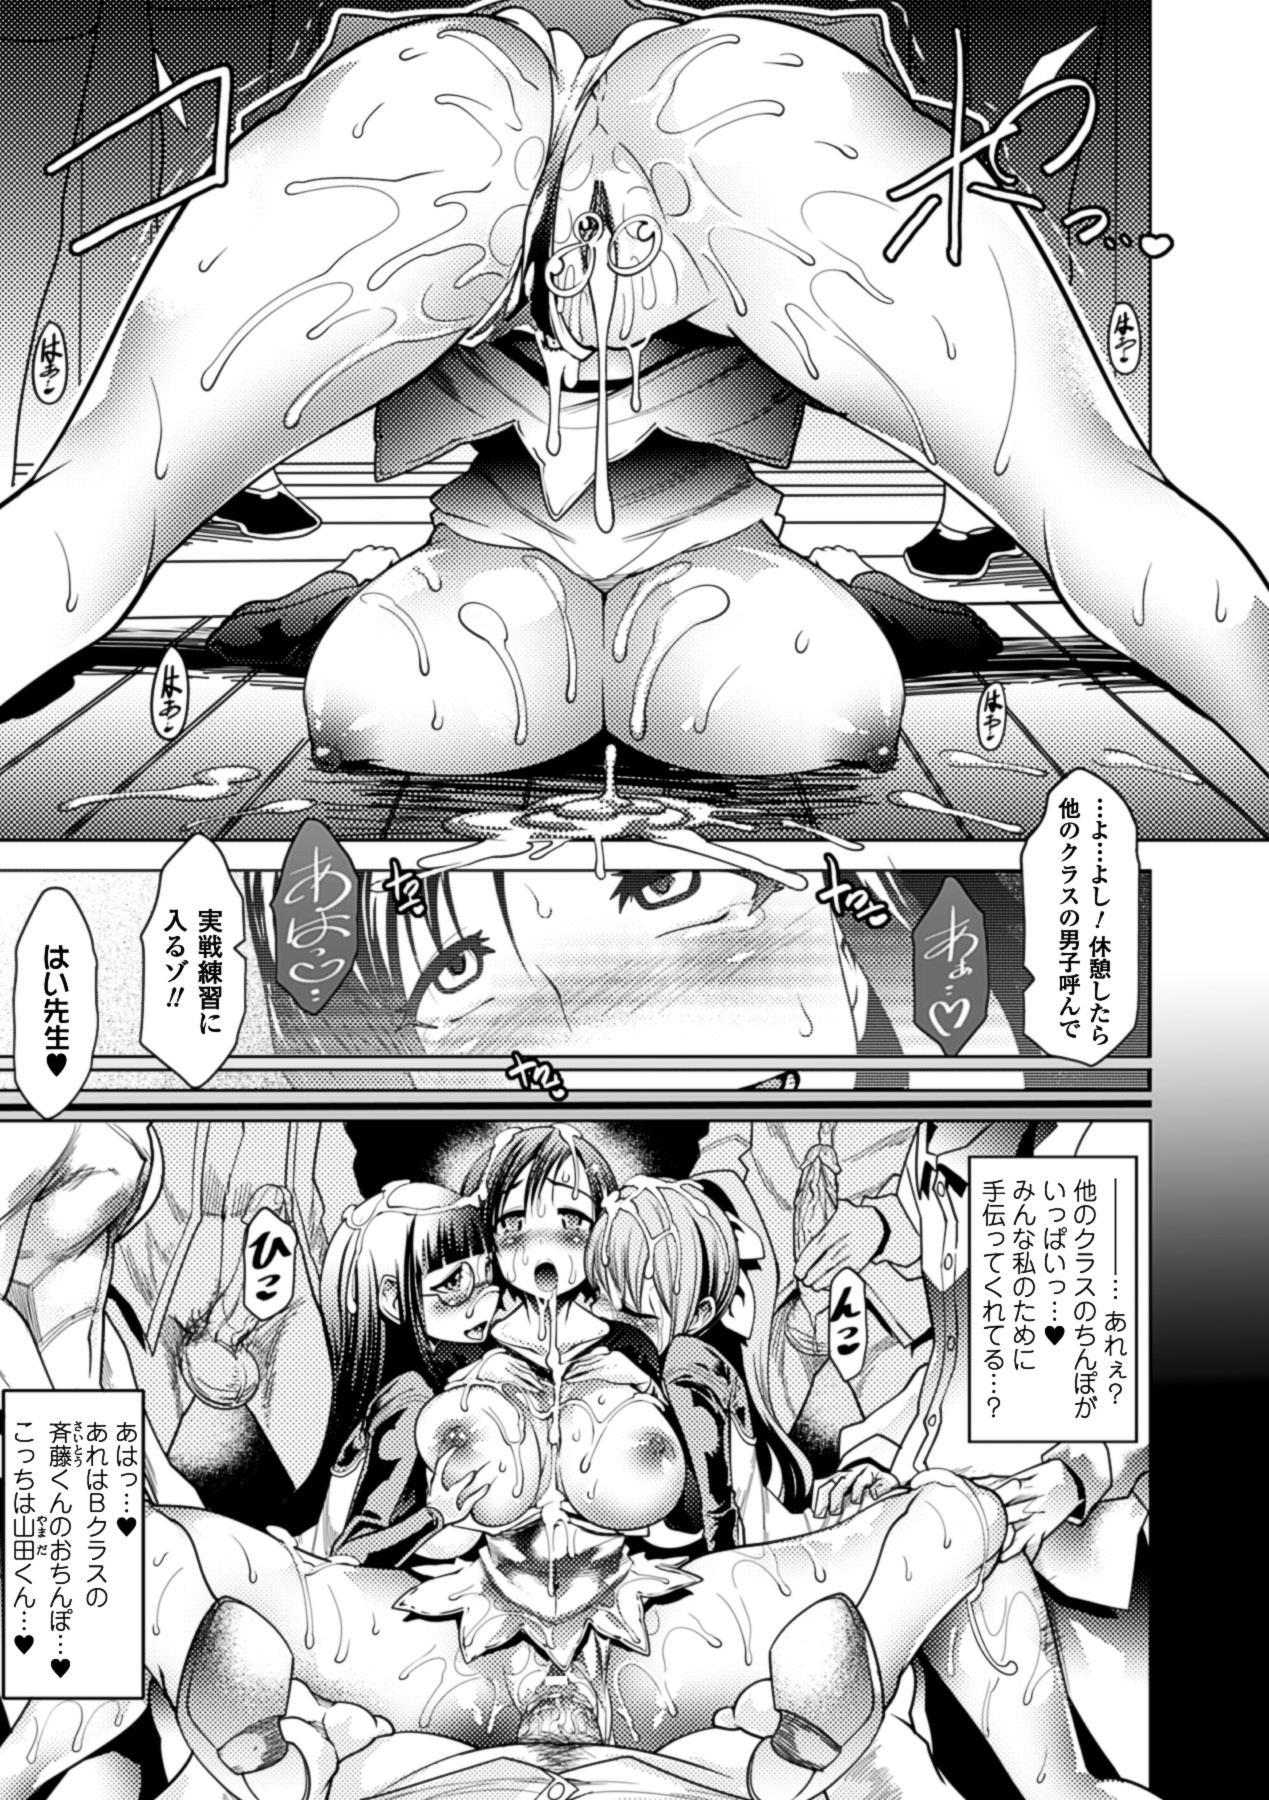 Bessatsu Comic Unreal - Joushiki ga Eroi Ijou na Sekai Vol.2 28